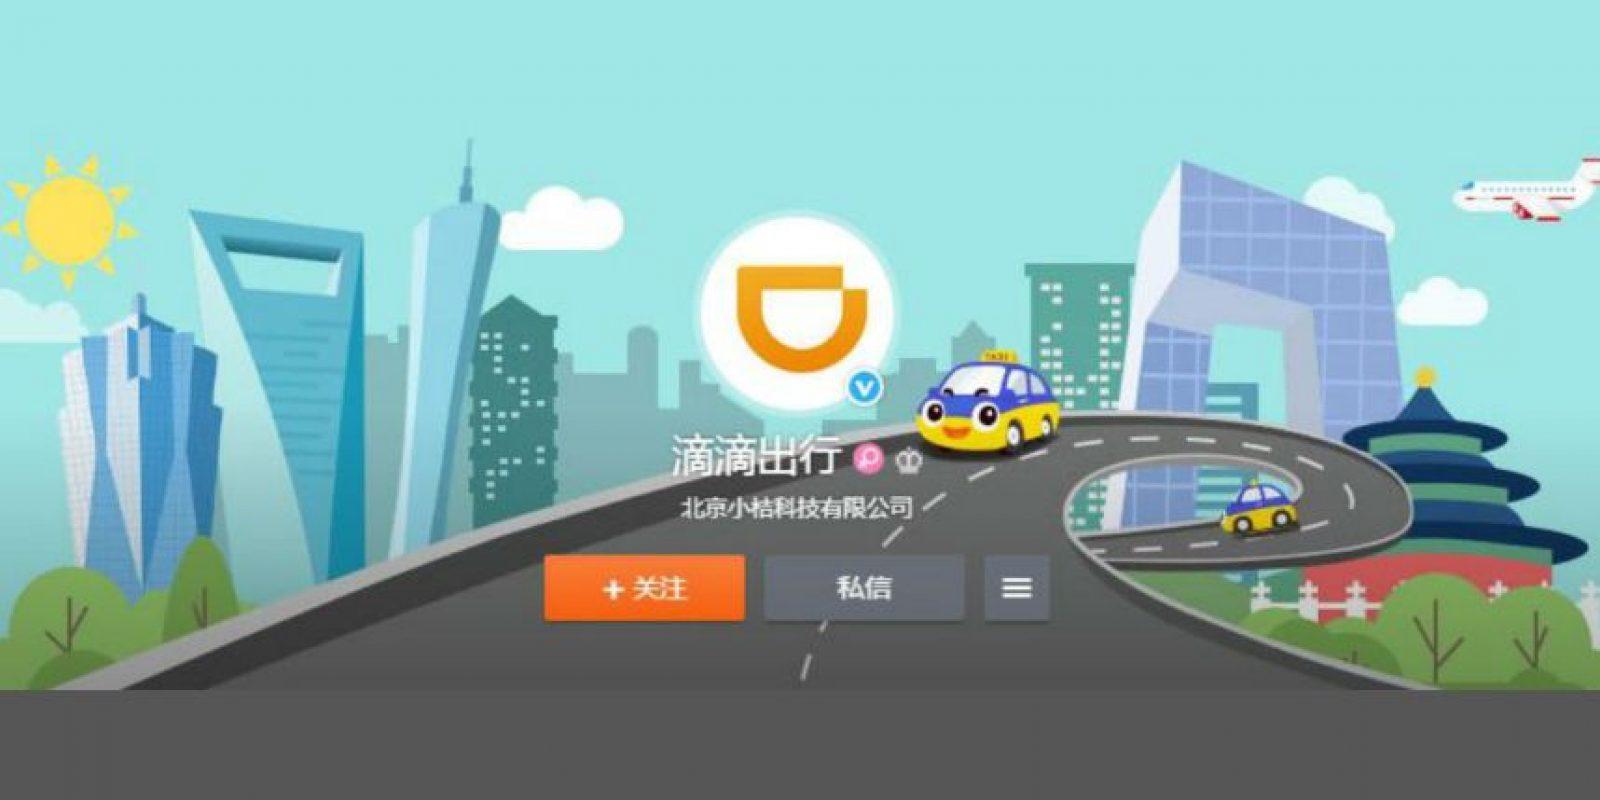 En China hay un problema de escasez de taxis. Foto:Didi Chuxing